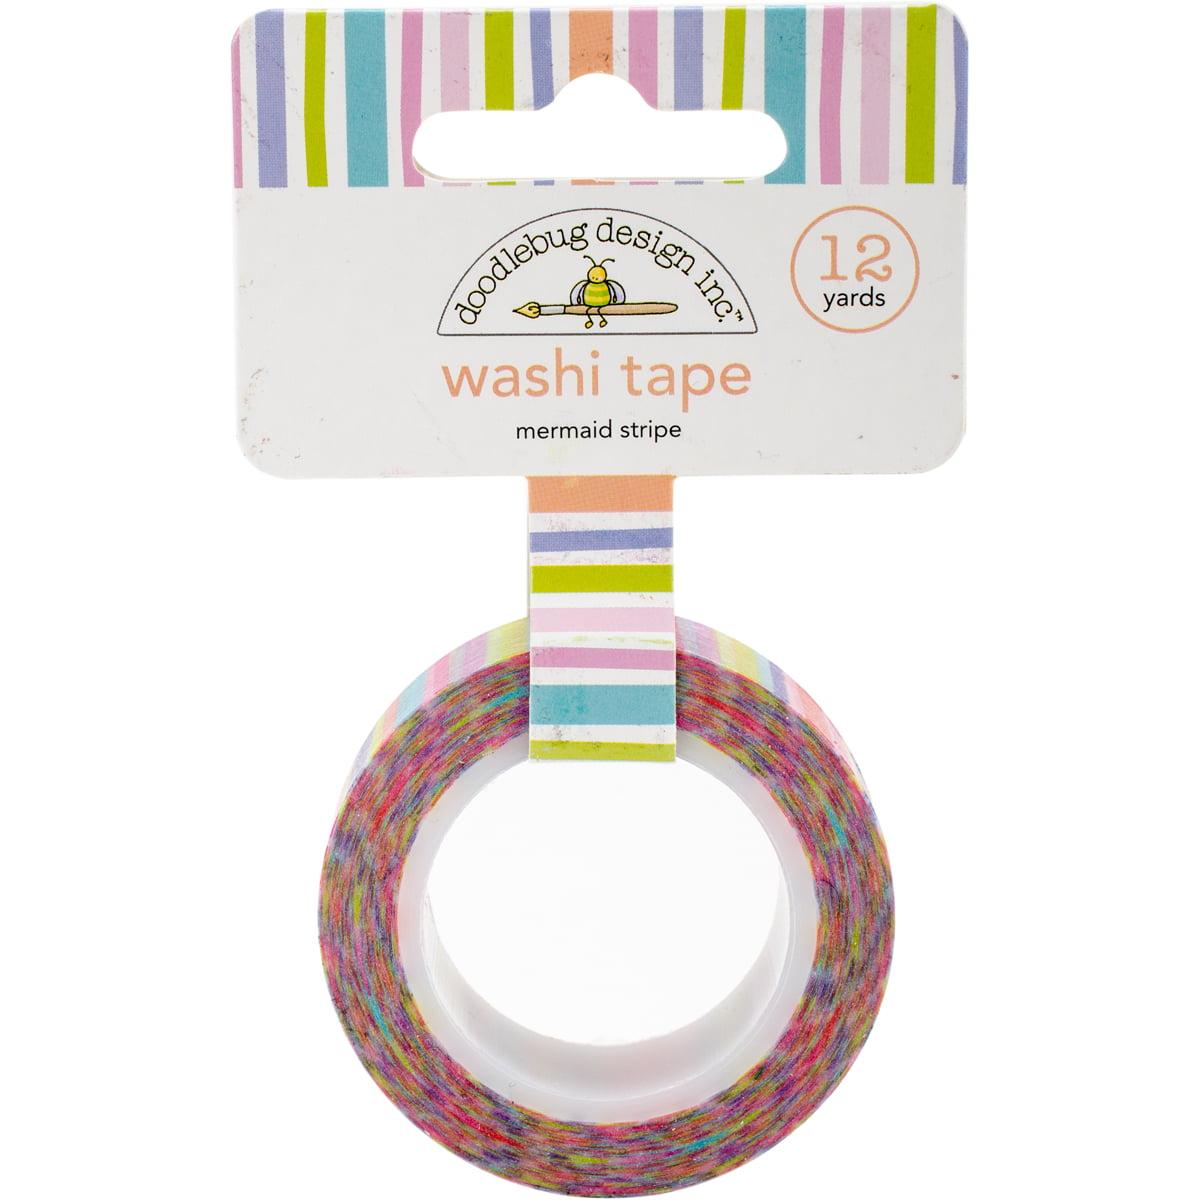 Doodlebug Washi Tape, 15mm x 12 yd